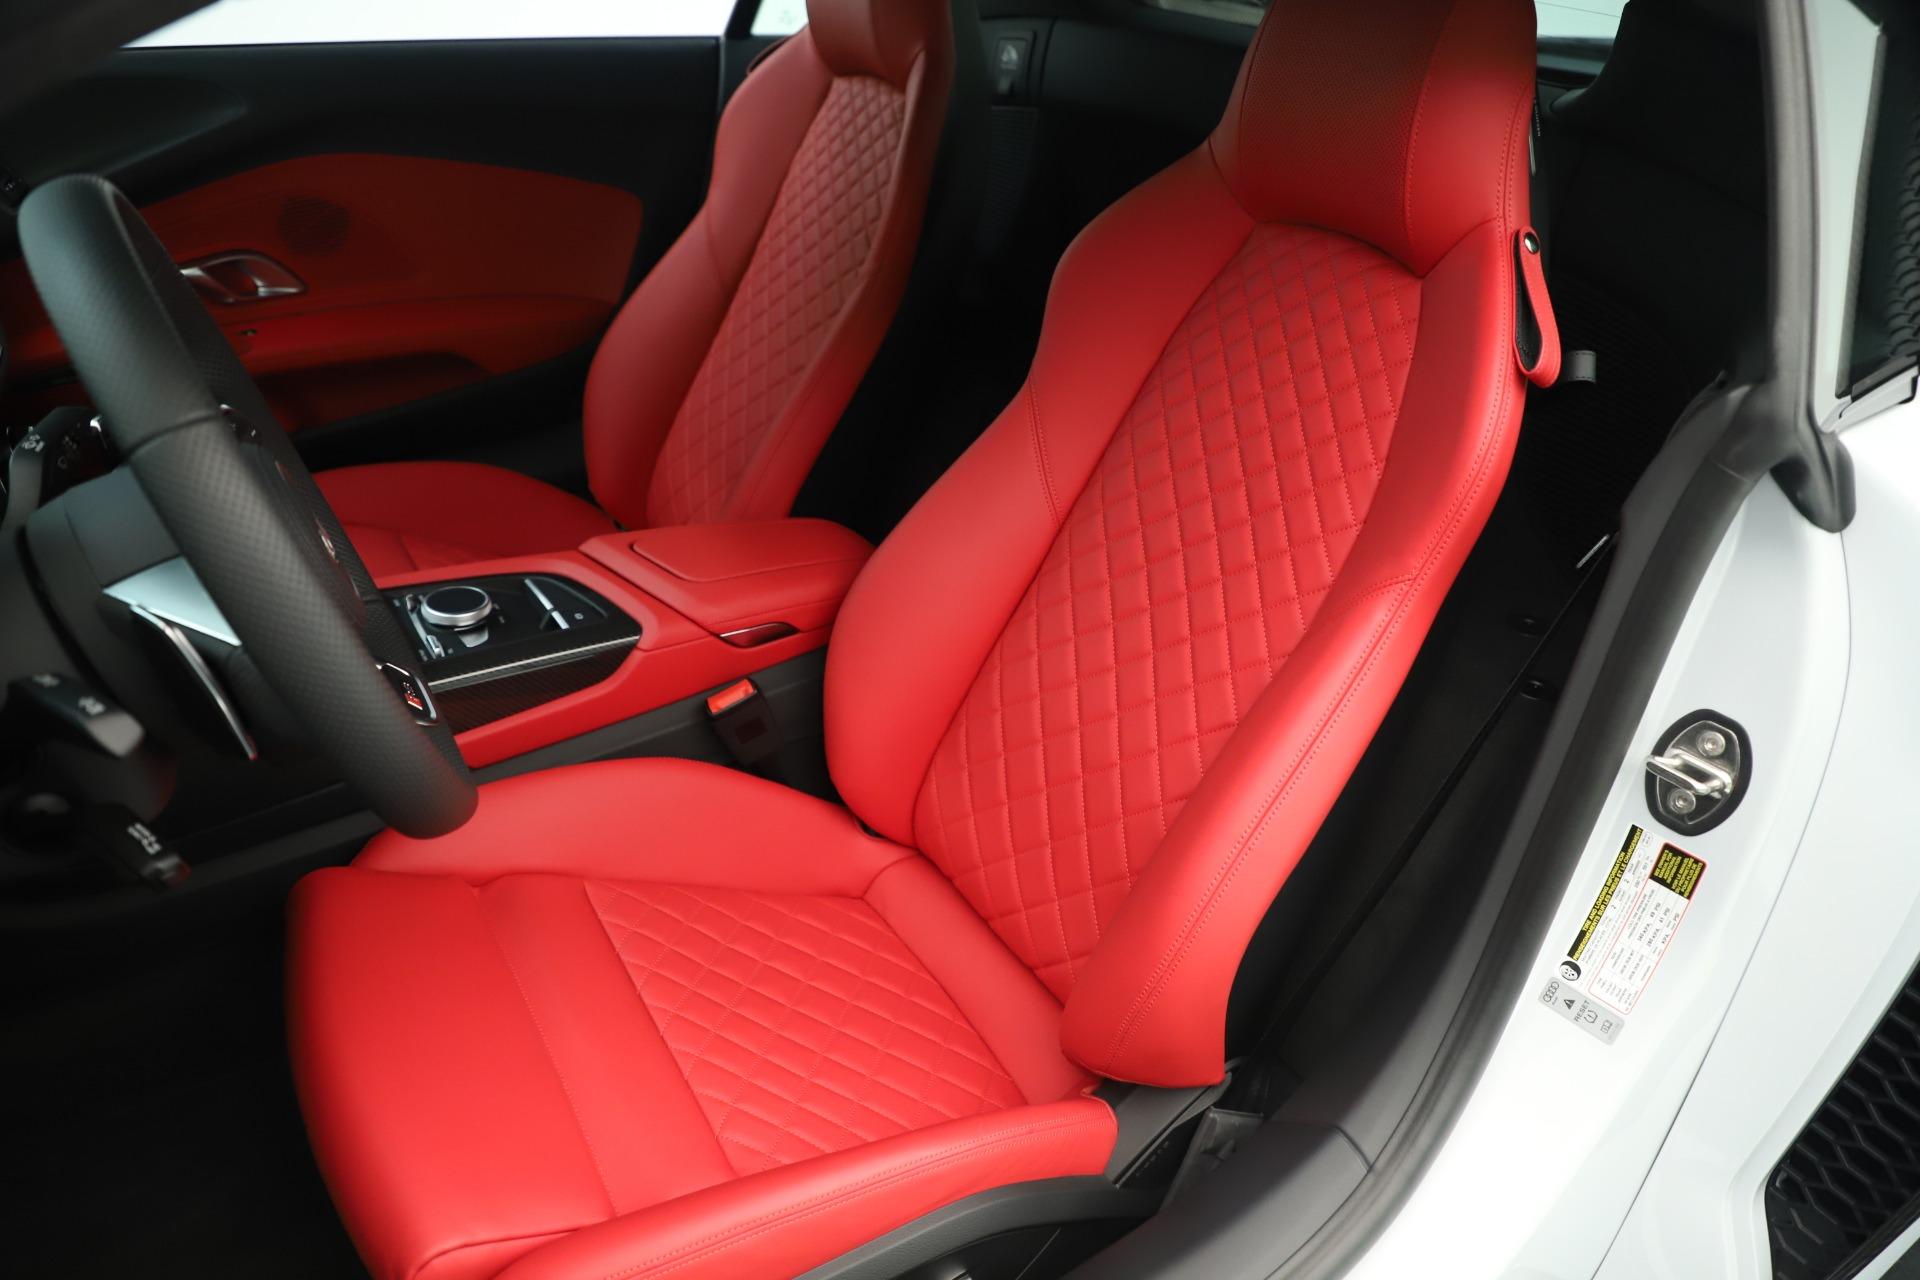 Used 2018 Audi R8 5.2 quattro V10 Plus For Sale 169900 In Greenwich, CT